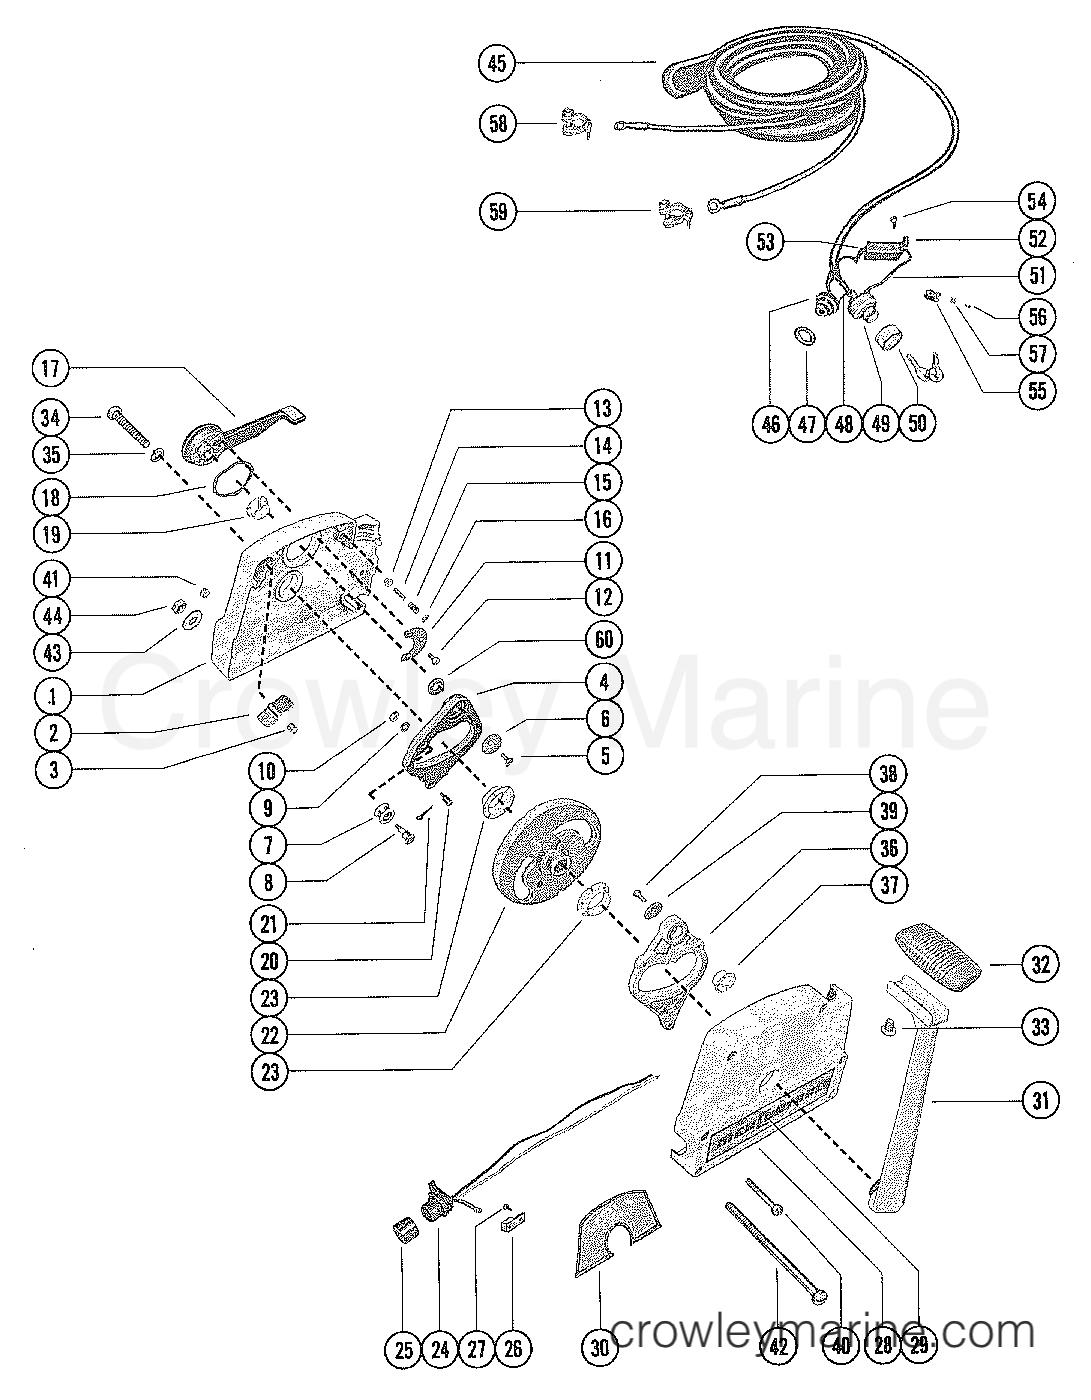 REMOTE CONTROL ASSEMBLY (ELECTRIC) - 1978 Mariner Outboard 115 [ELPT]  7115628 | Crowley MarineCrowley Marine